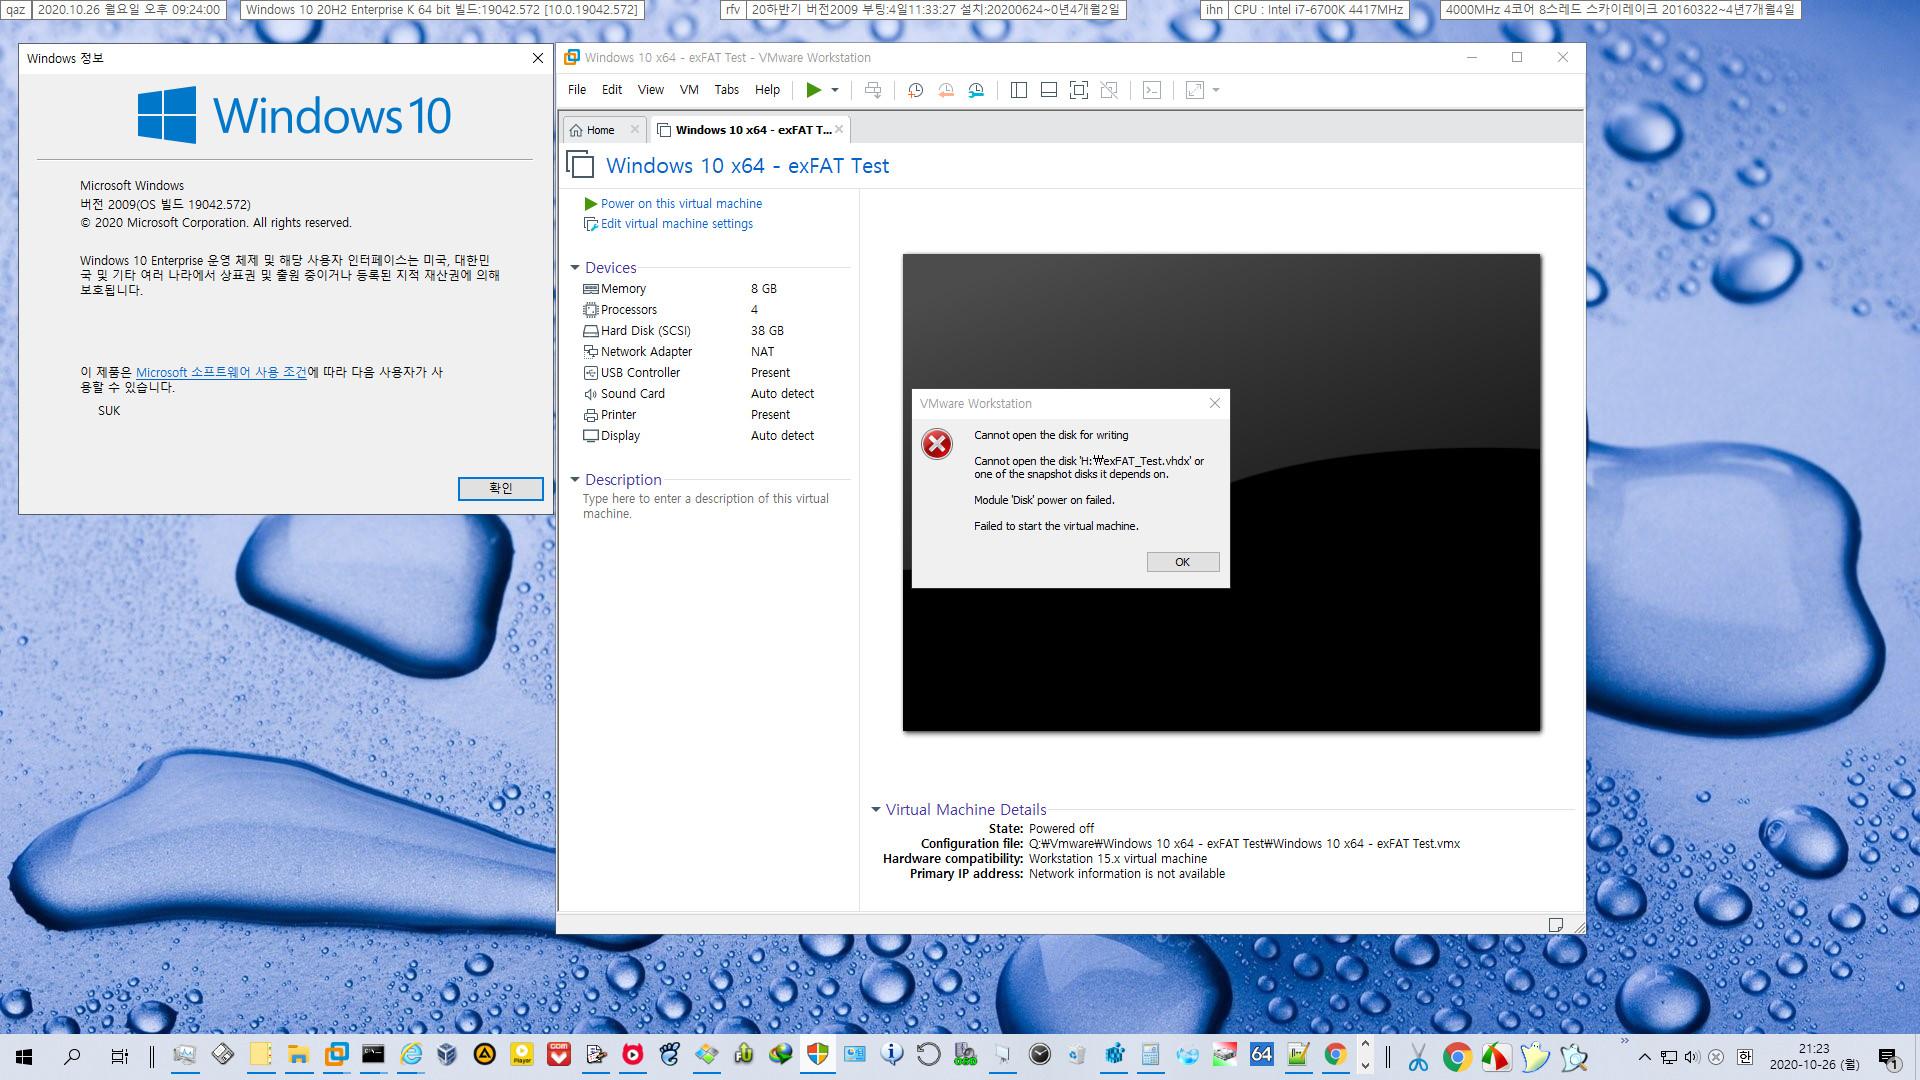 exFAT 포맷으로도 VHD 부팅이 Windows 10 버전 1903부터 된다고 하여 테스트 - 완전 생고생 했습니다 2020-10-26_212400.jpg